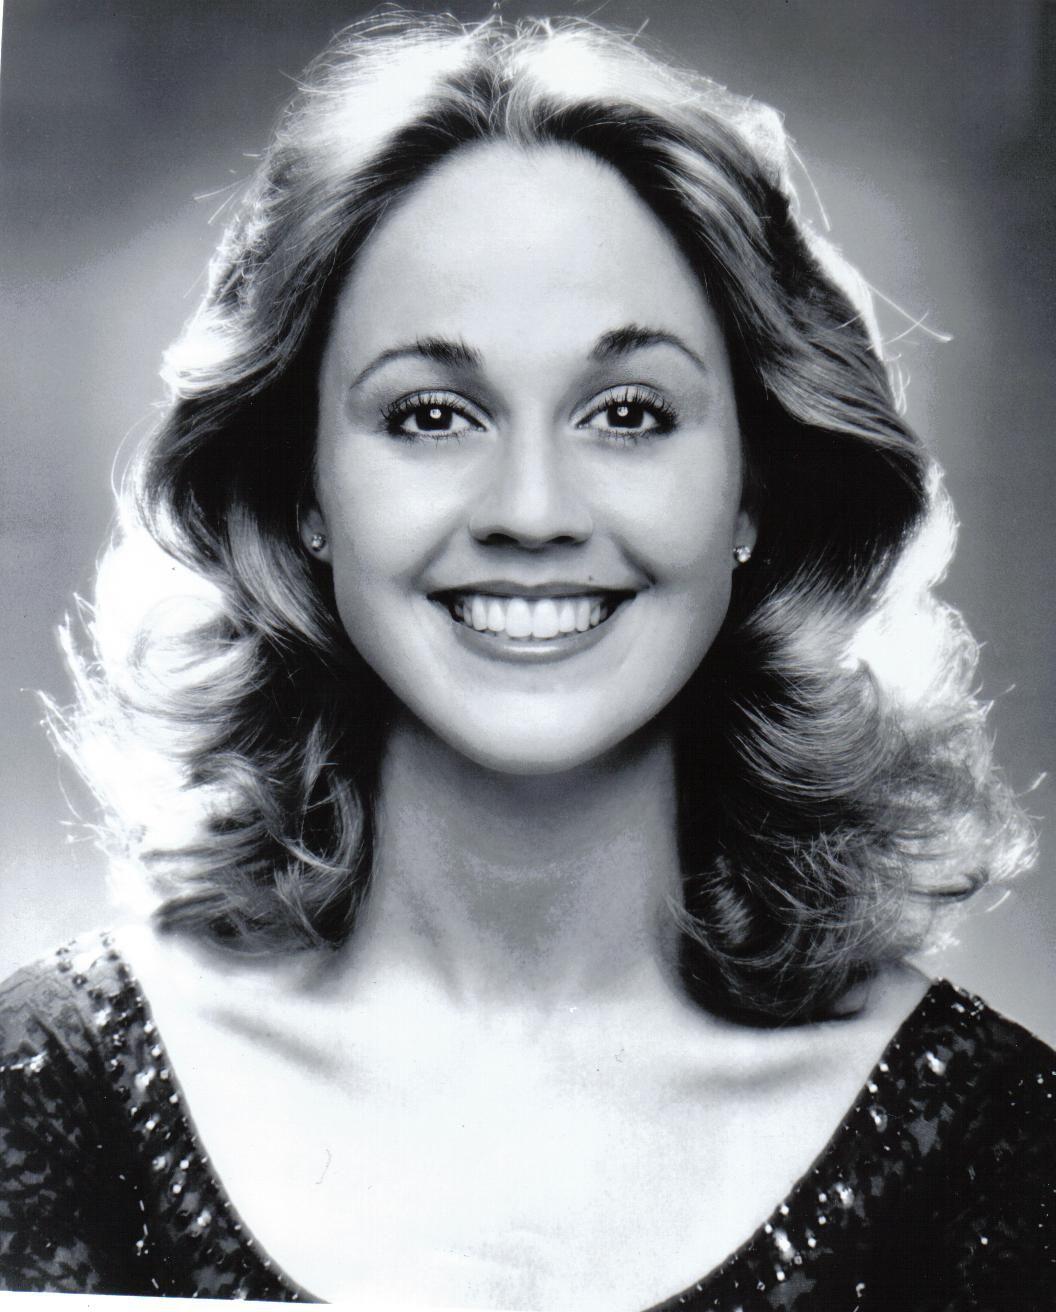 1978: Susan Perkins from Columbus, Ohio